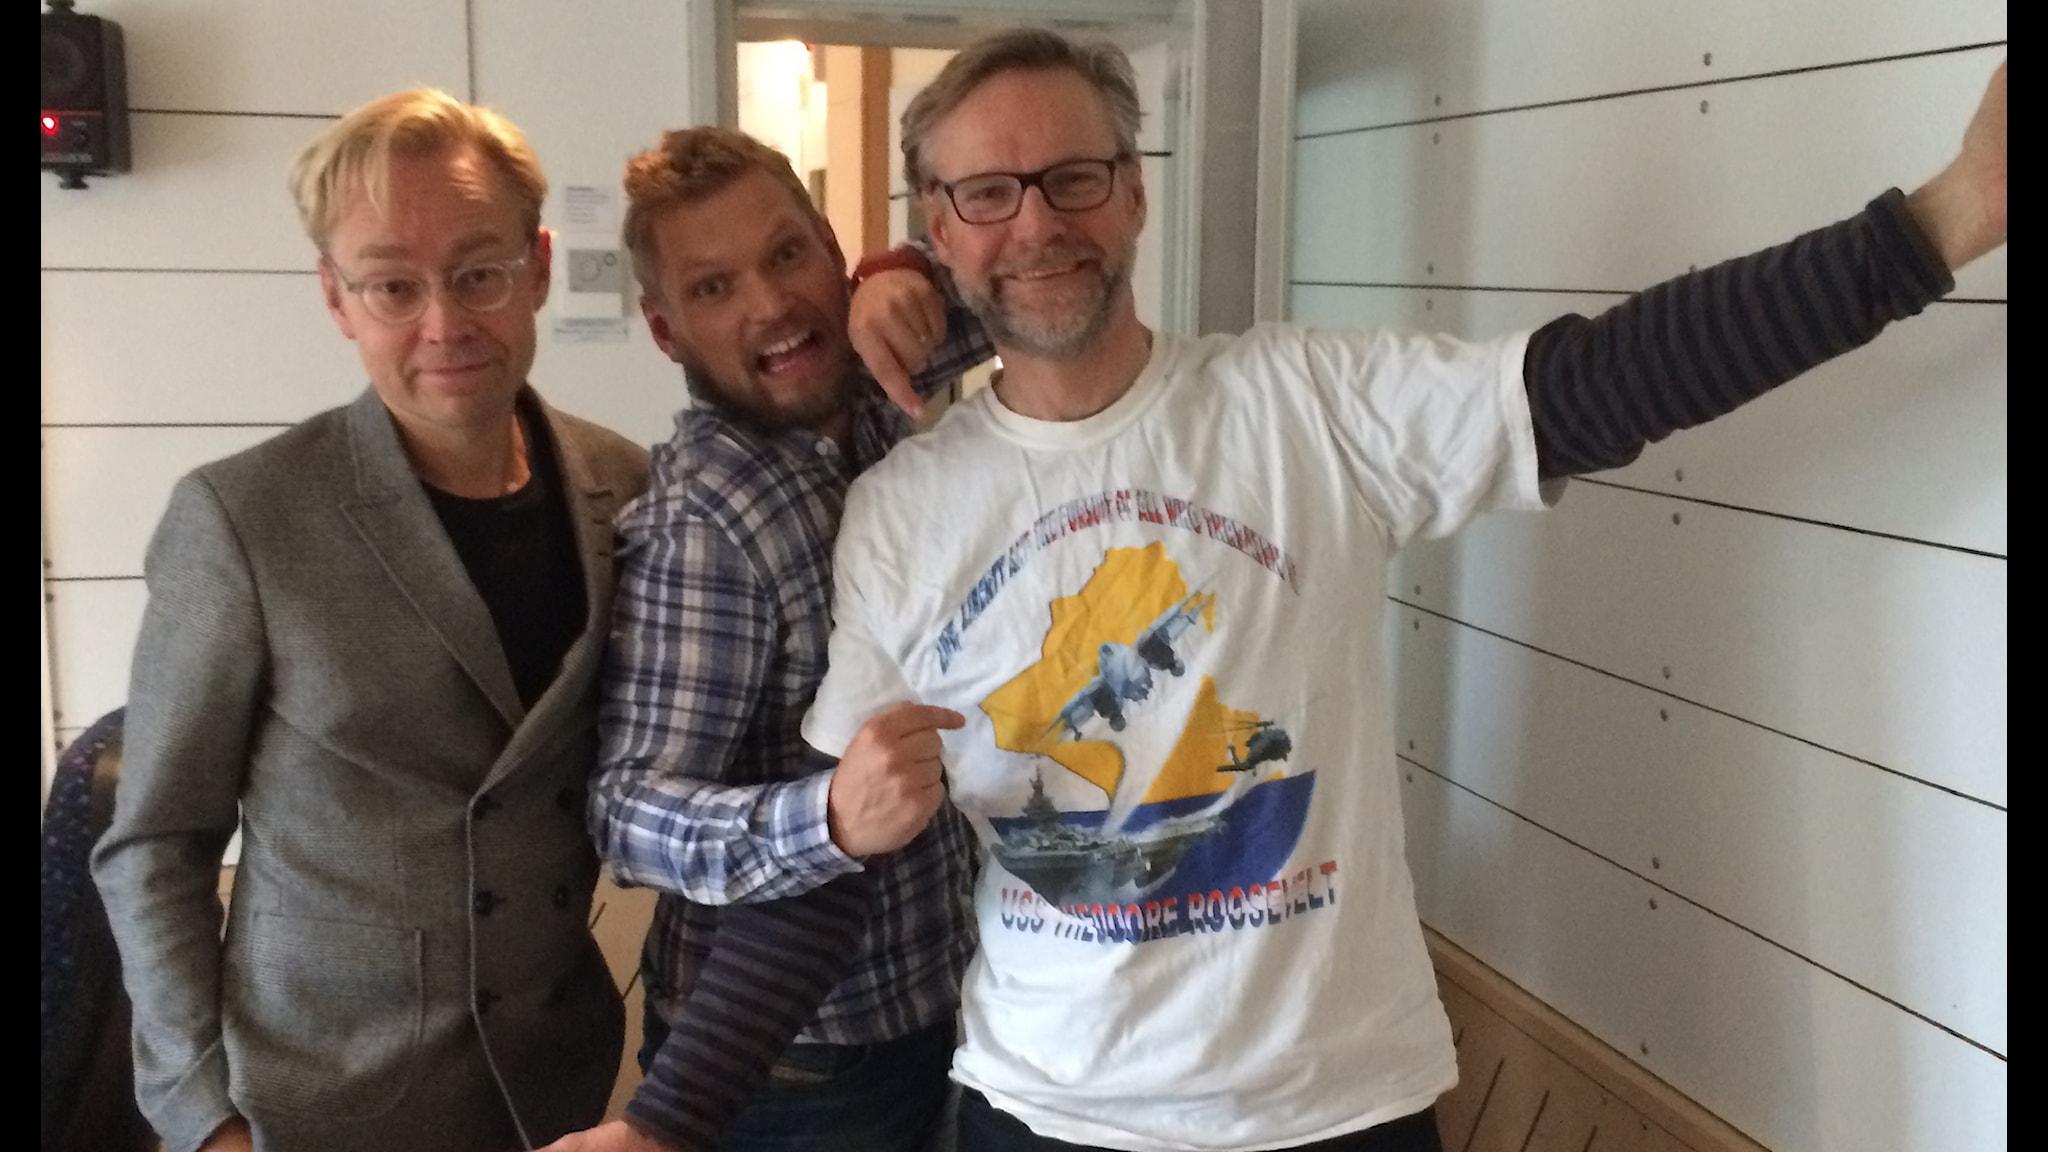 Fredrik Furtenbach, Henrik Torehammar och Tomas Ramberg. Foto: SR.